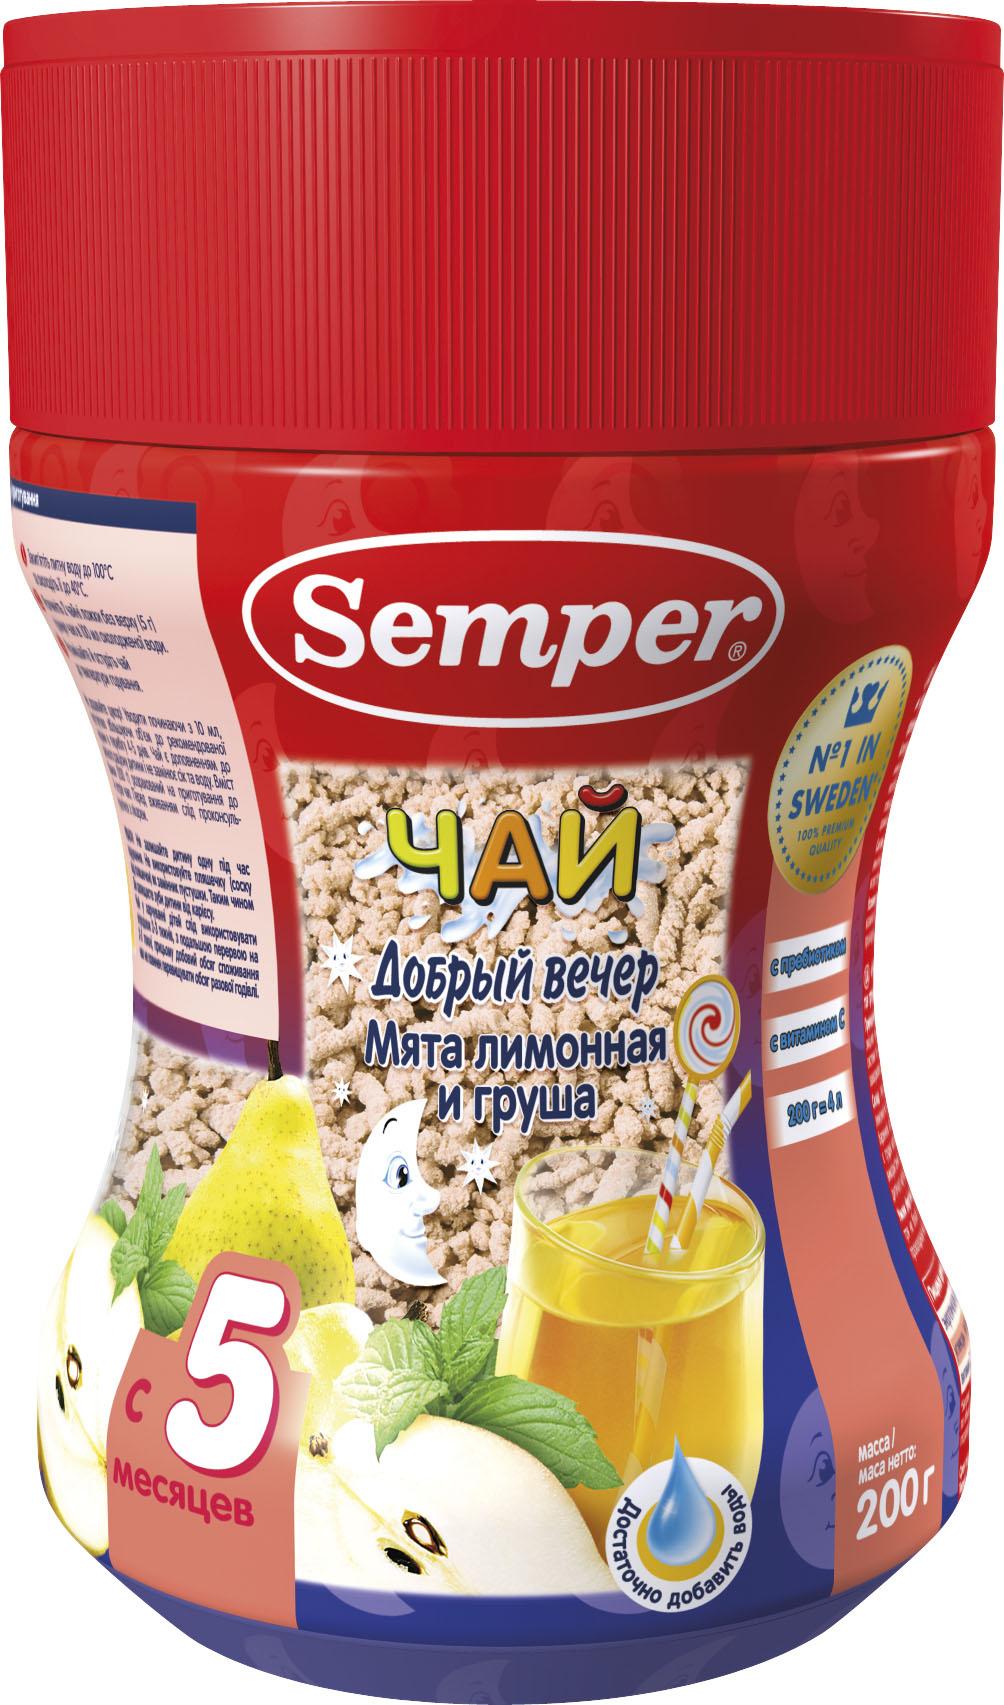 Чай Semper Добрый вечер Мята лимонная и гуша с 5 мес. 200 г